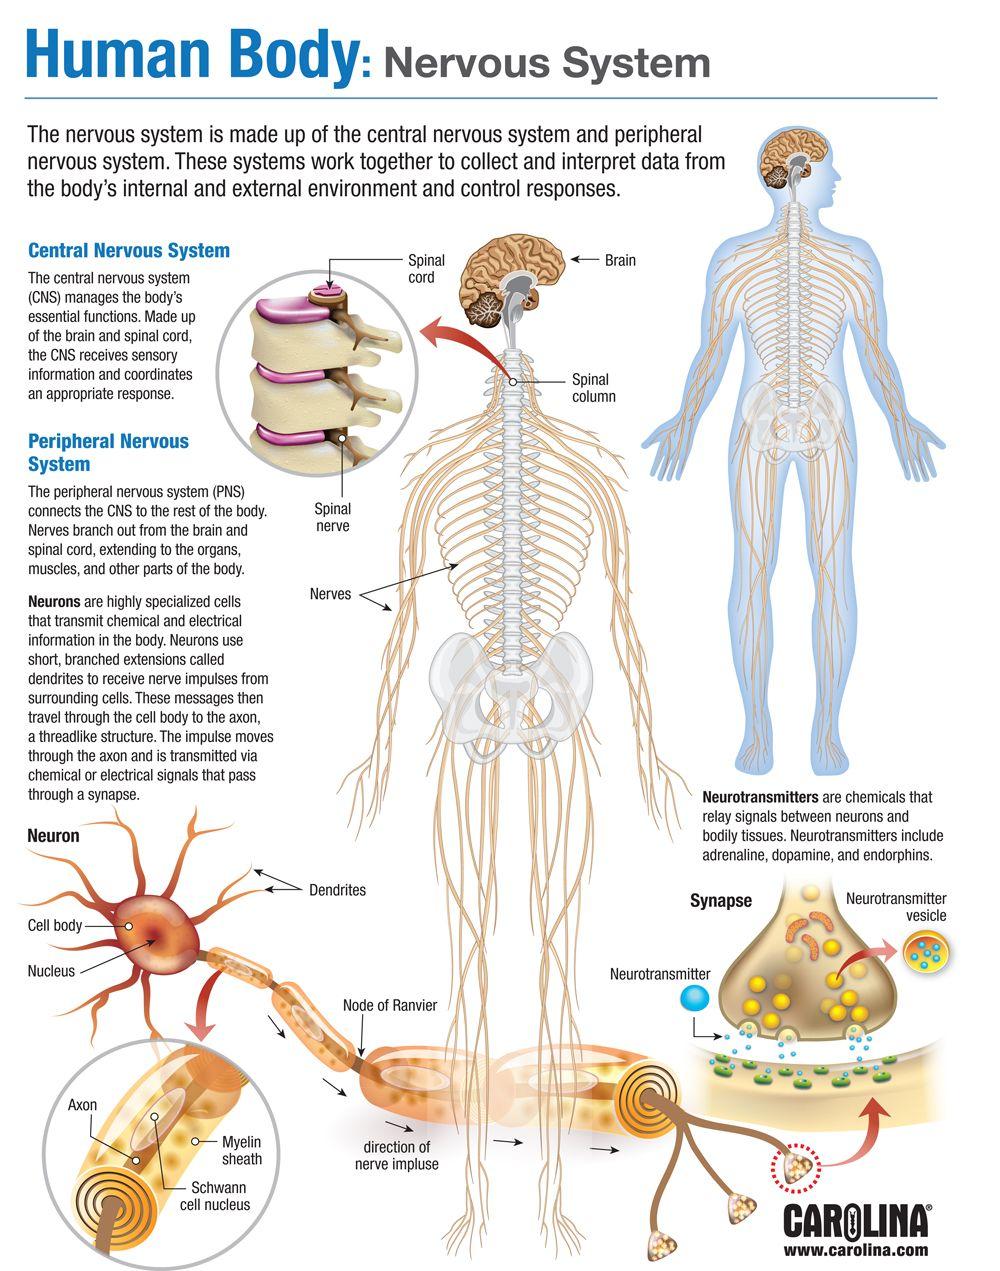 Human Body Nervous System Human Body Nervous System Basic Anatomy And Physiology Human Anatomy And Physiology